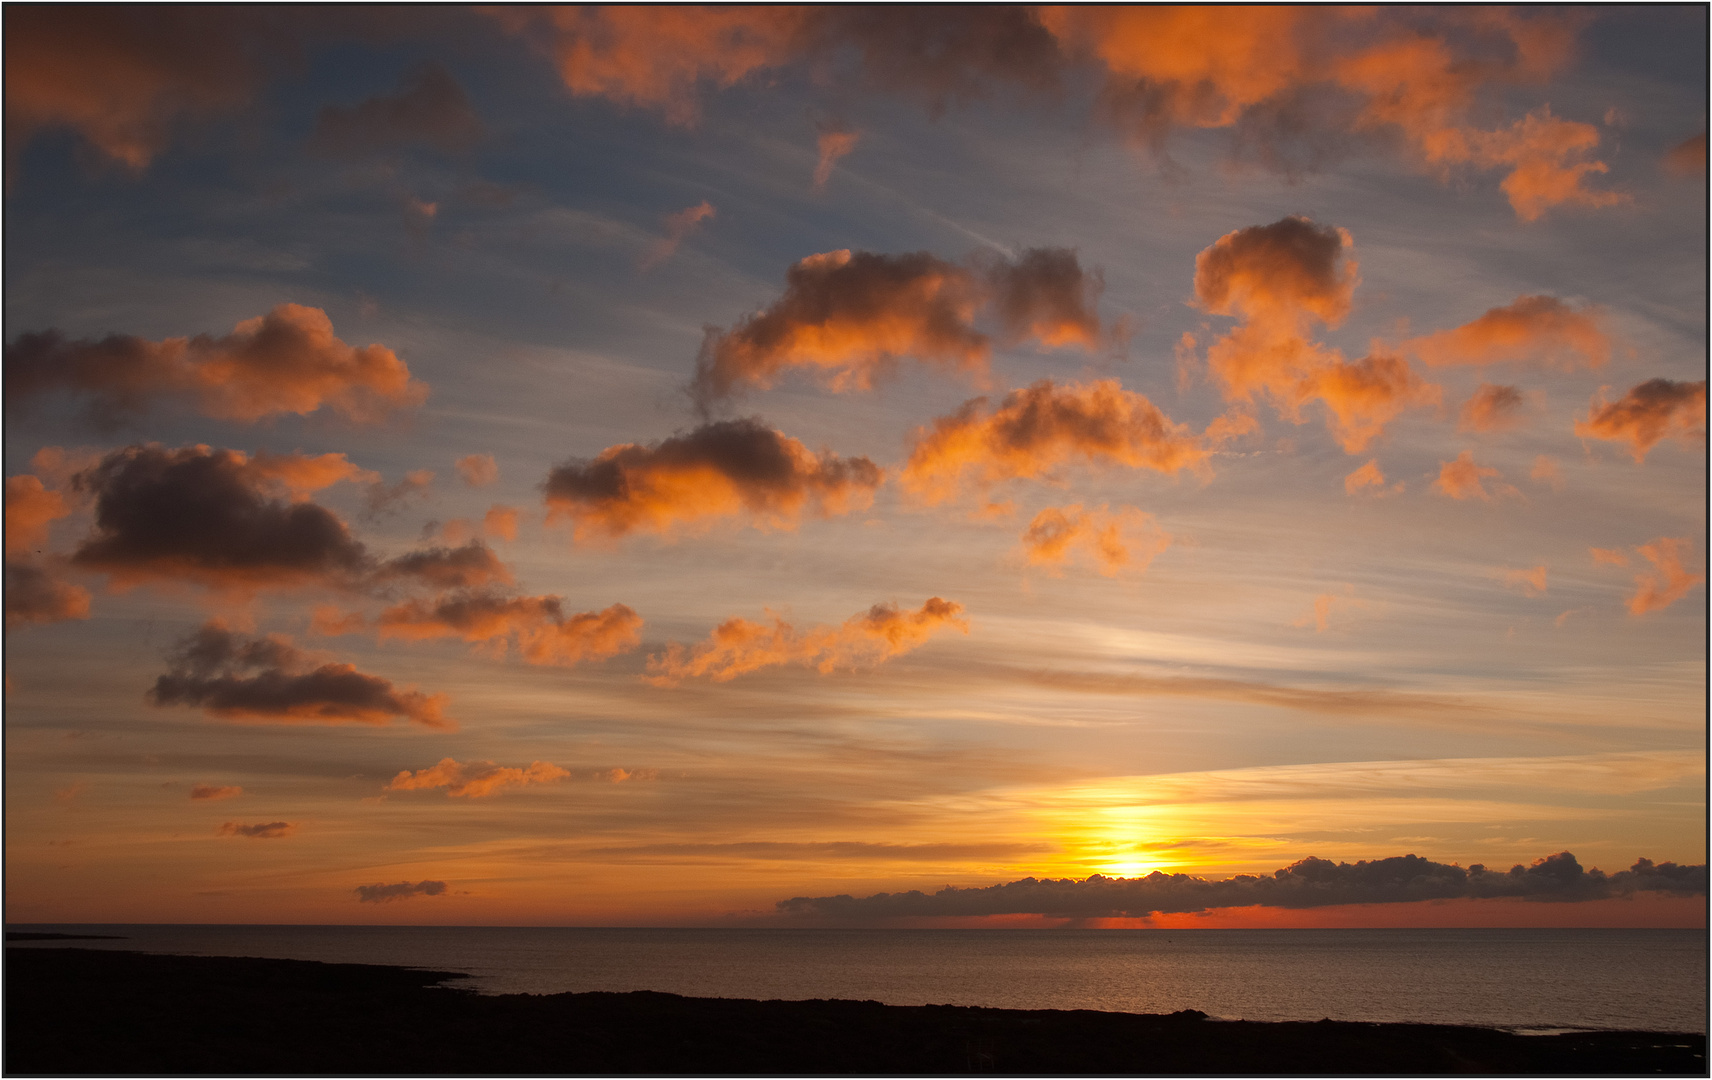 Sunrise in Punta Mujeres